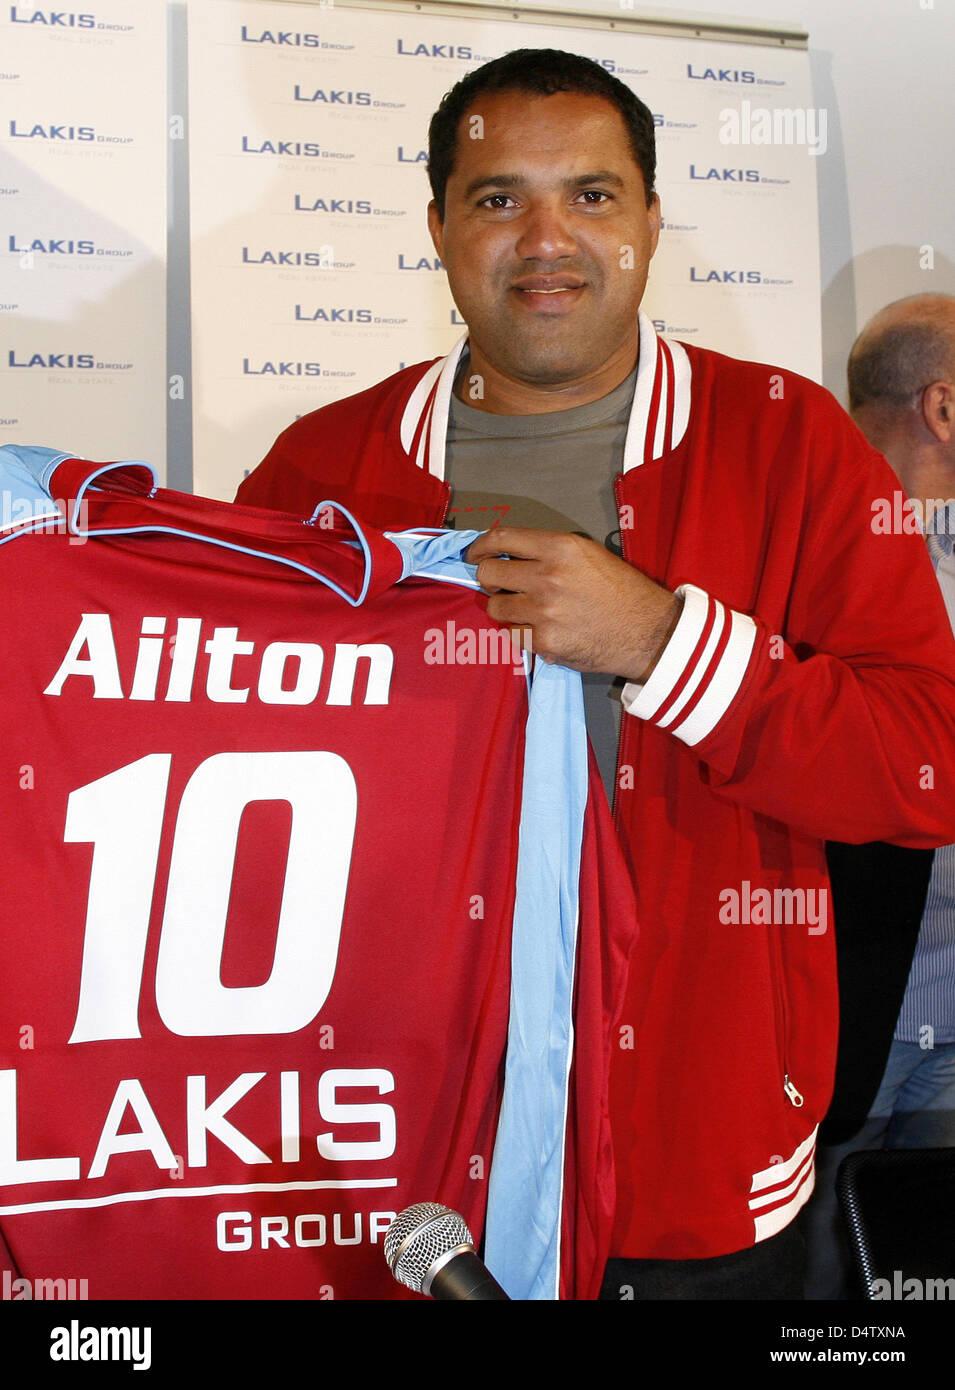 Brazilian soccer player Ailton presents his jersey at soccer club KFC Uerdingen 05 in Krefeld, Germany, 02 December Stock Photo